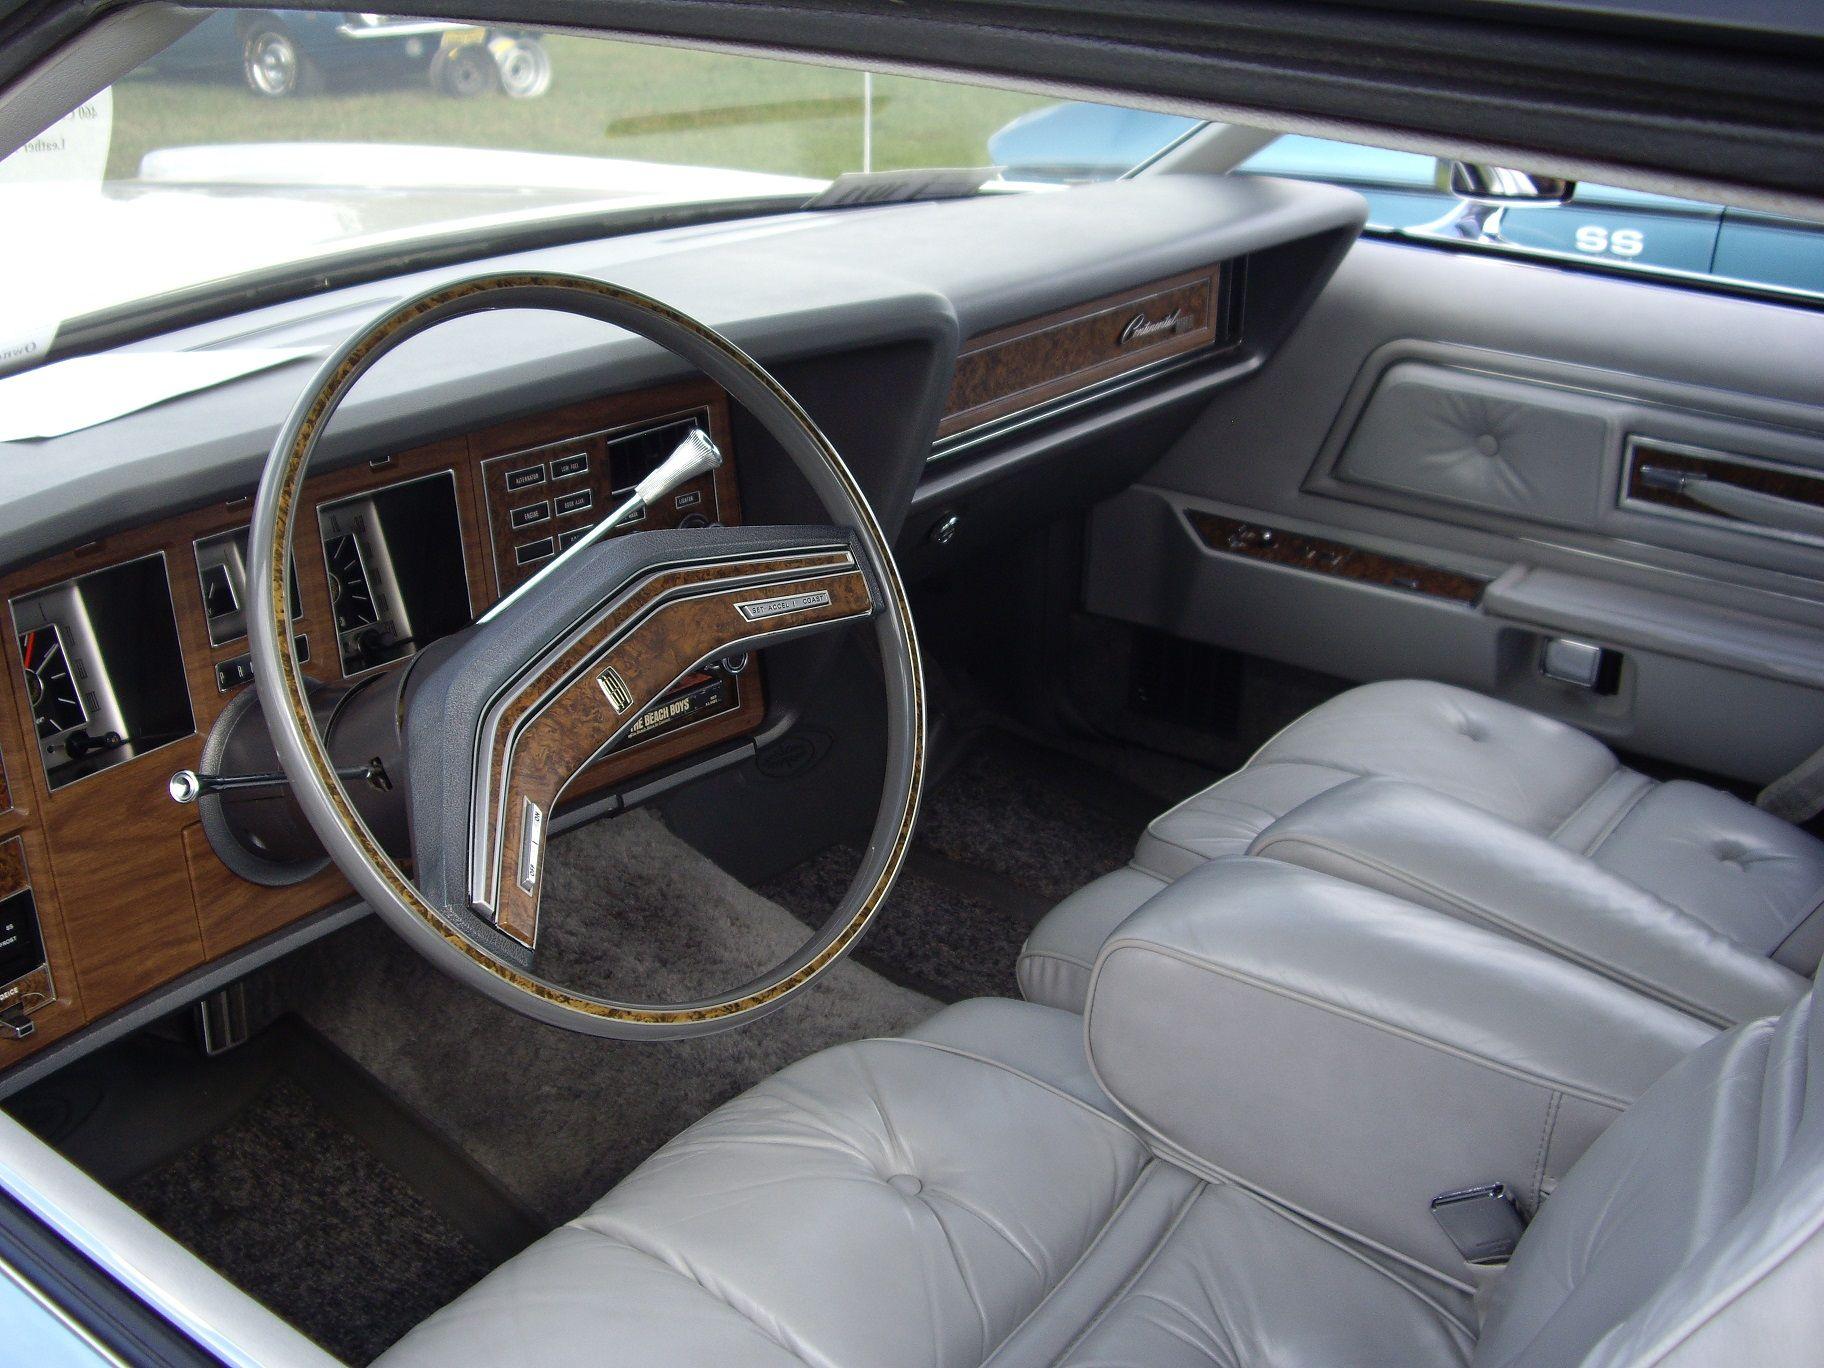 1976 mark iv cartier edition interior classic car interiors pinterest cartier car. Black Bedroom Furniture Sets. Home Design Ideas